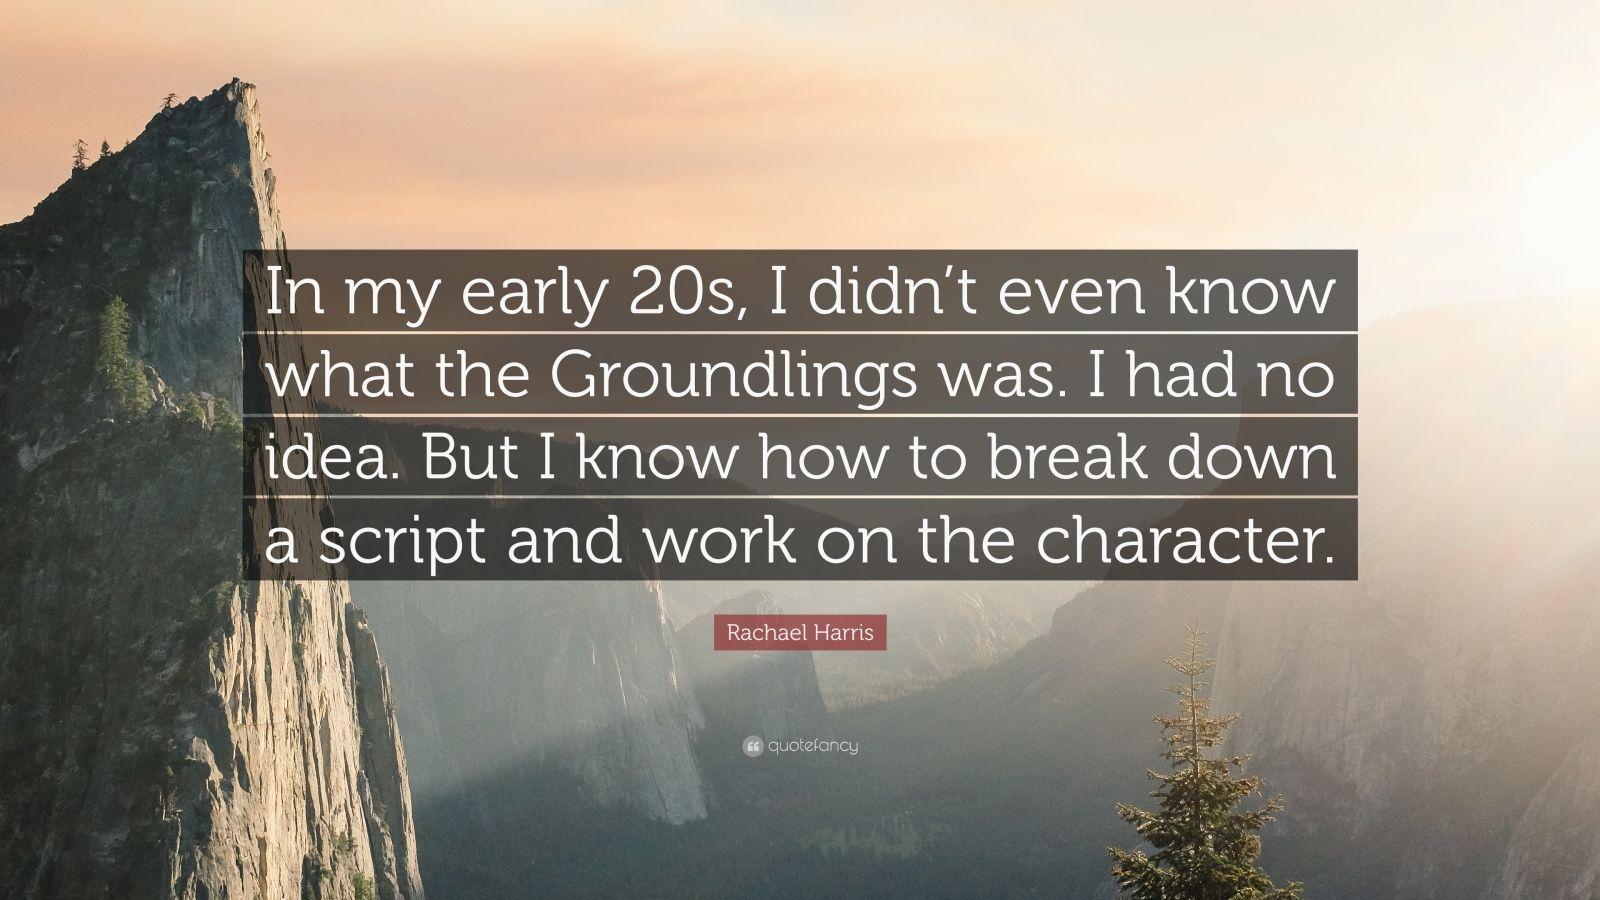 how to break down a script